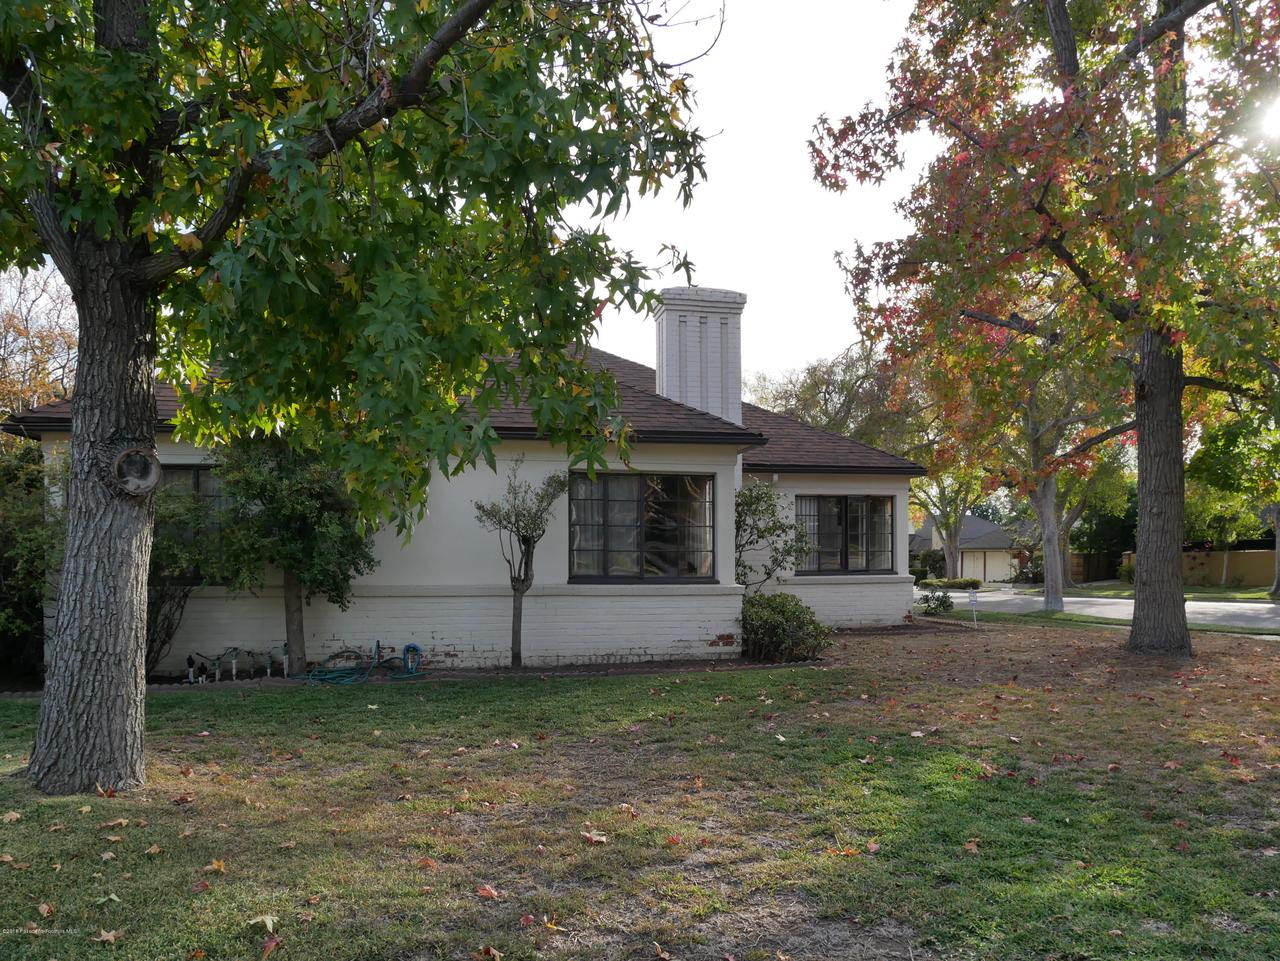 2432 ORANGE GROVE, Pasadena, CA 91104 - Front yard 3